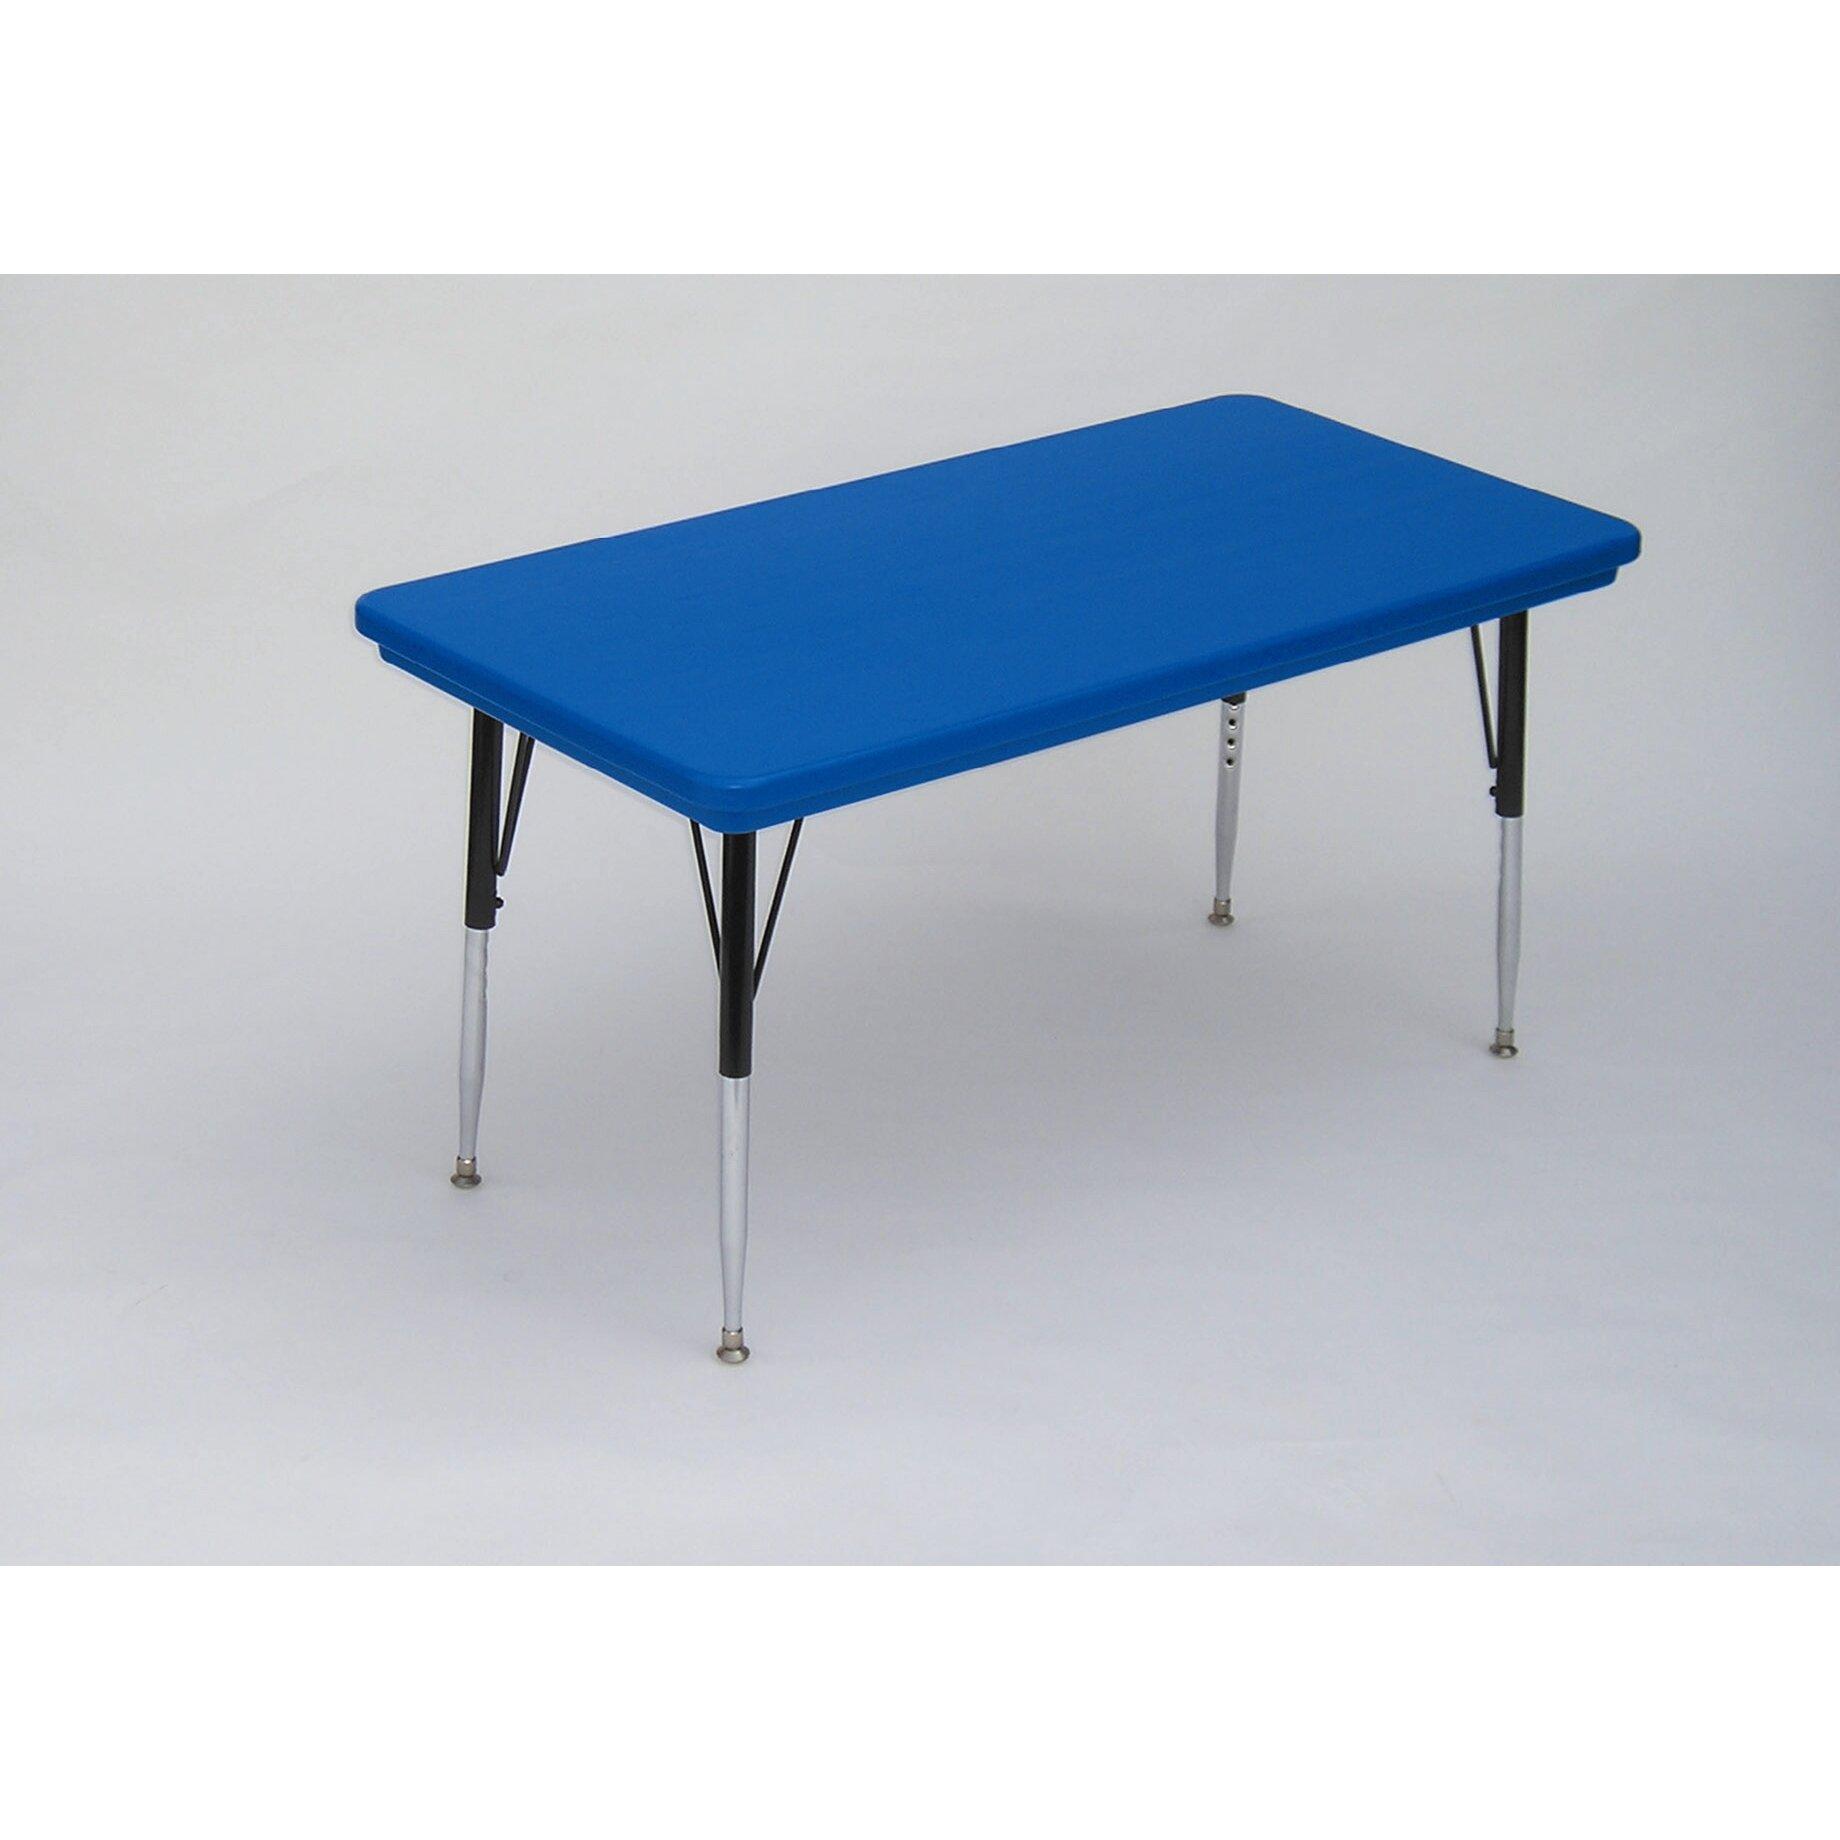 correll inc 72 x 30 rectangular activity table. Black Bedroom Furniture Sets. Home Design Ideas